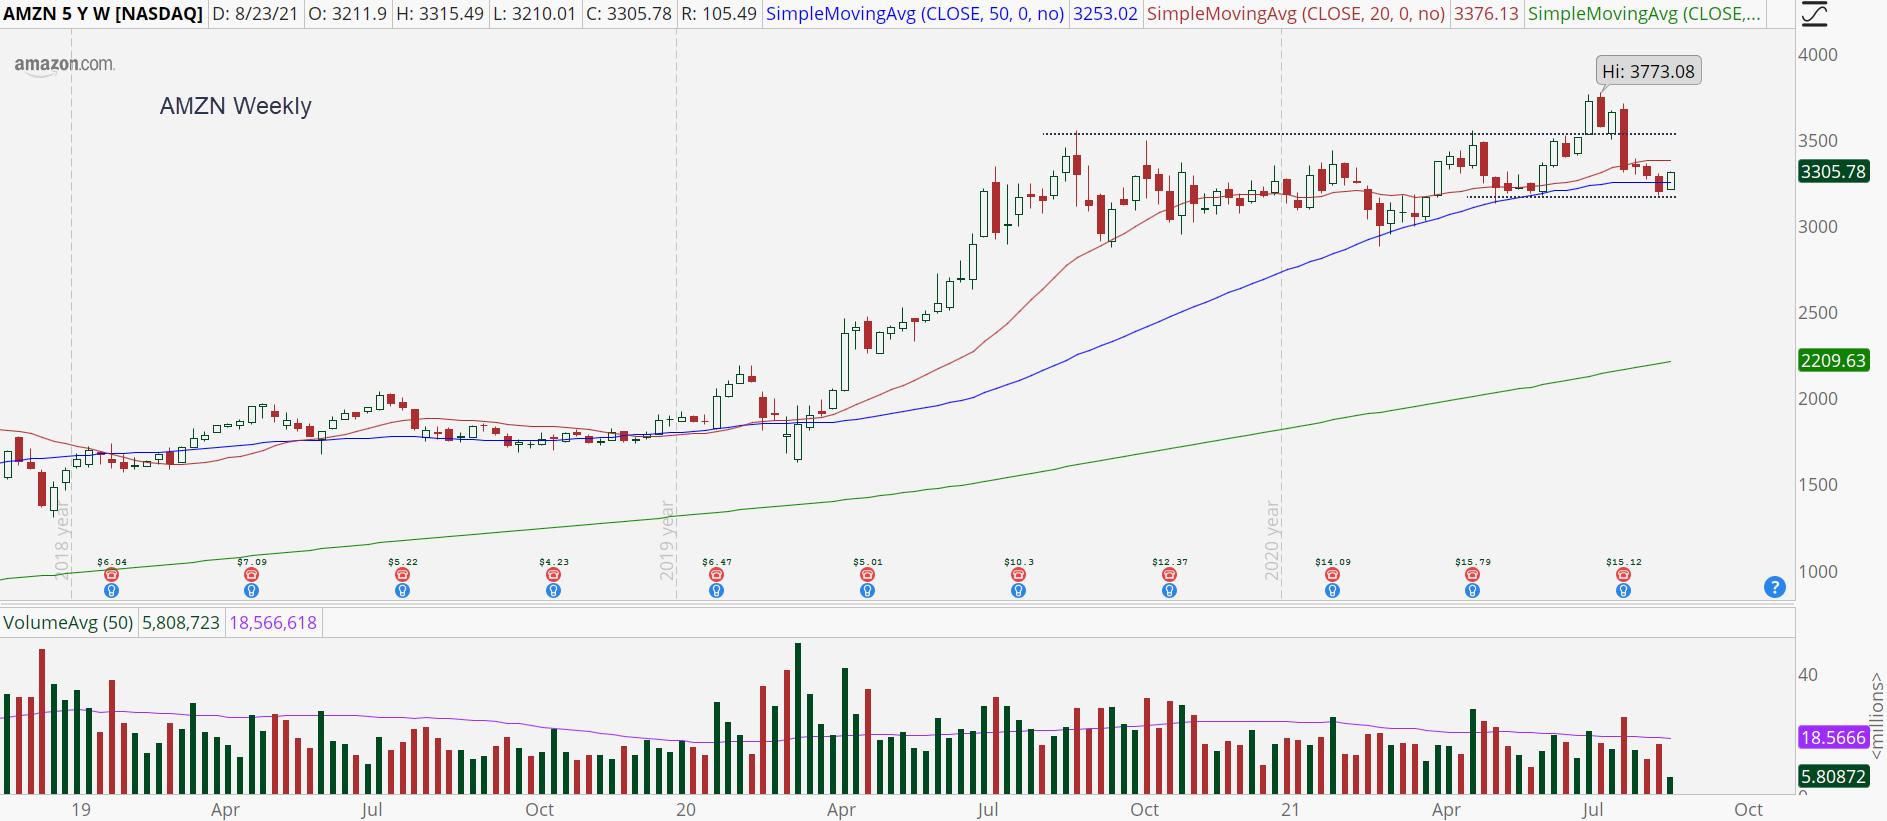 Amazon (AMZN) weekly stock chart with support bounce